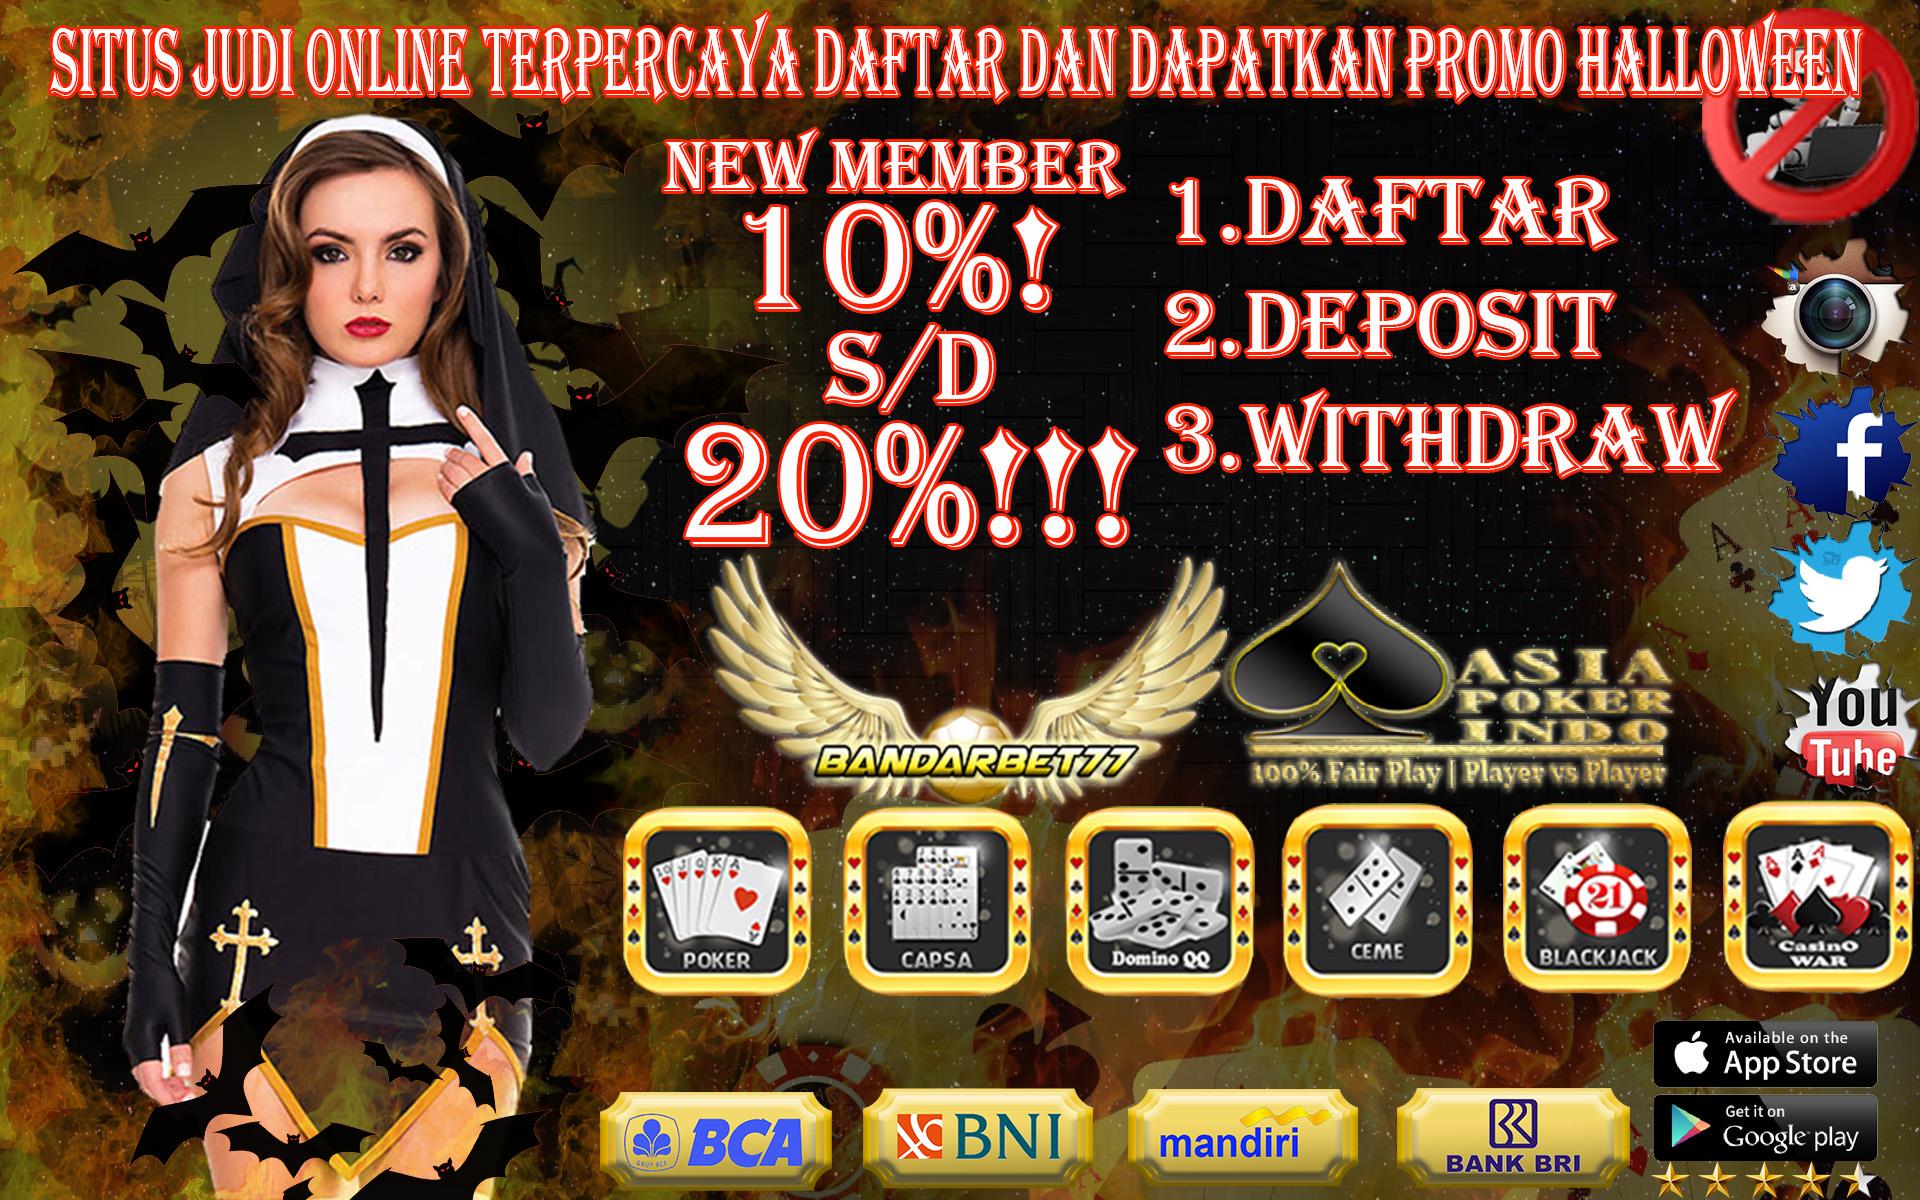 Website Poker Judi Online Terbesar Indoneisa Terbaru